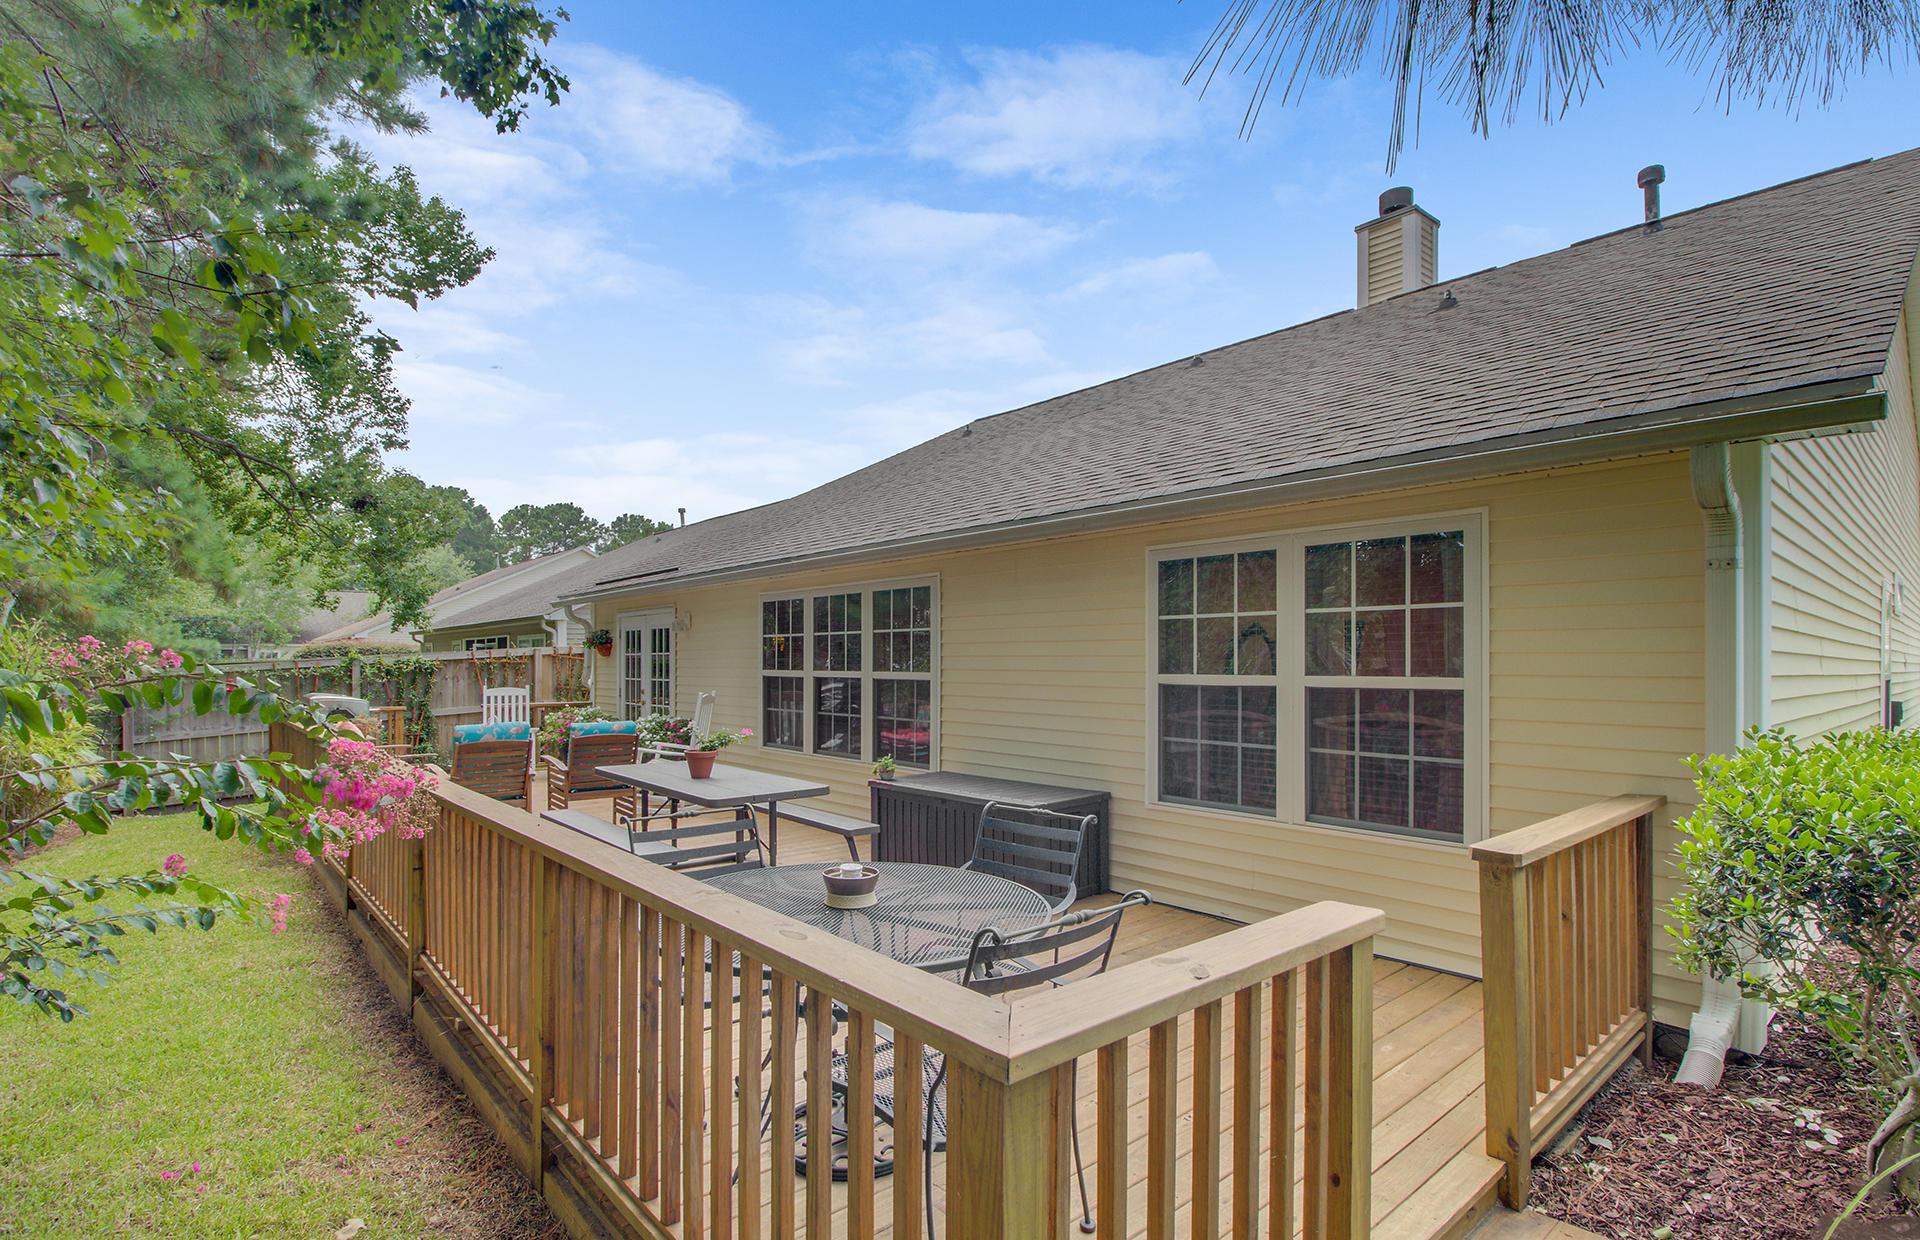 Park West Homes For Sale - 1500 Wellesley, Mount Pleasant, SC - 9